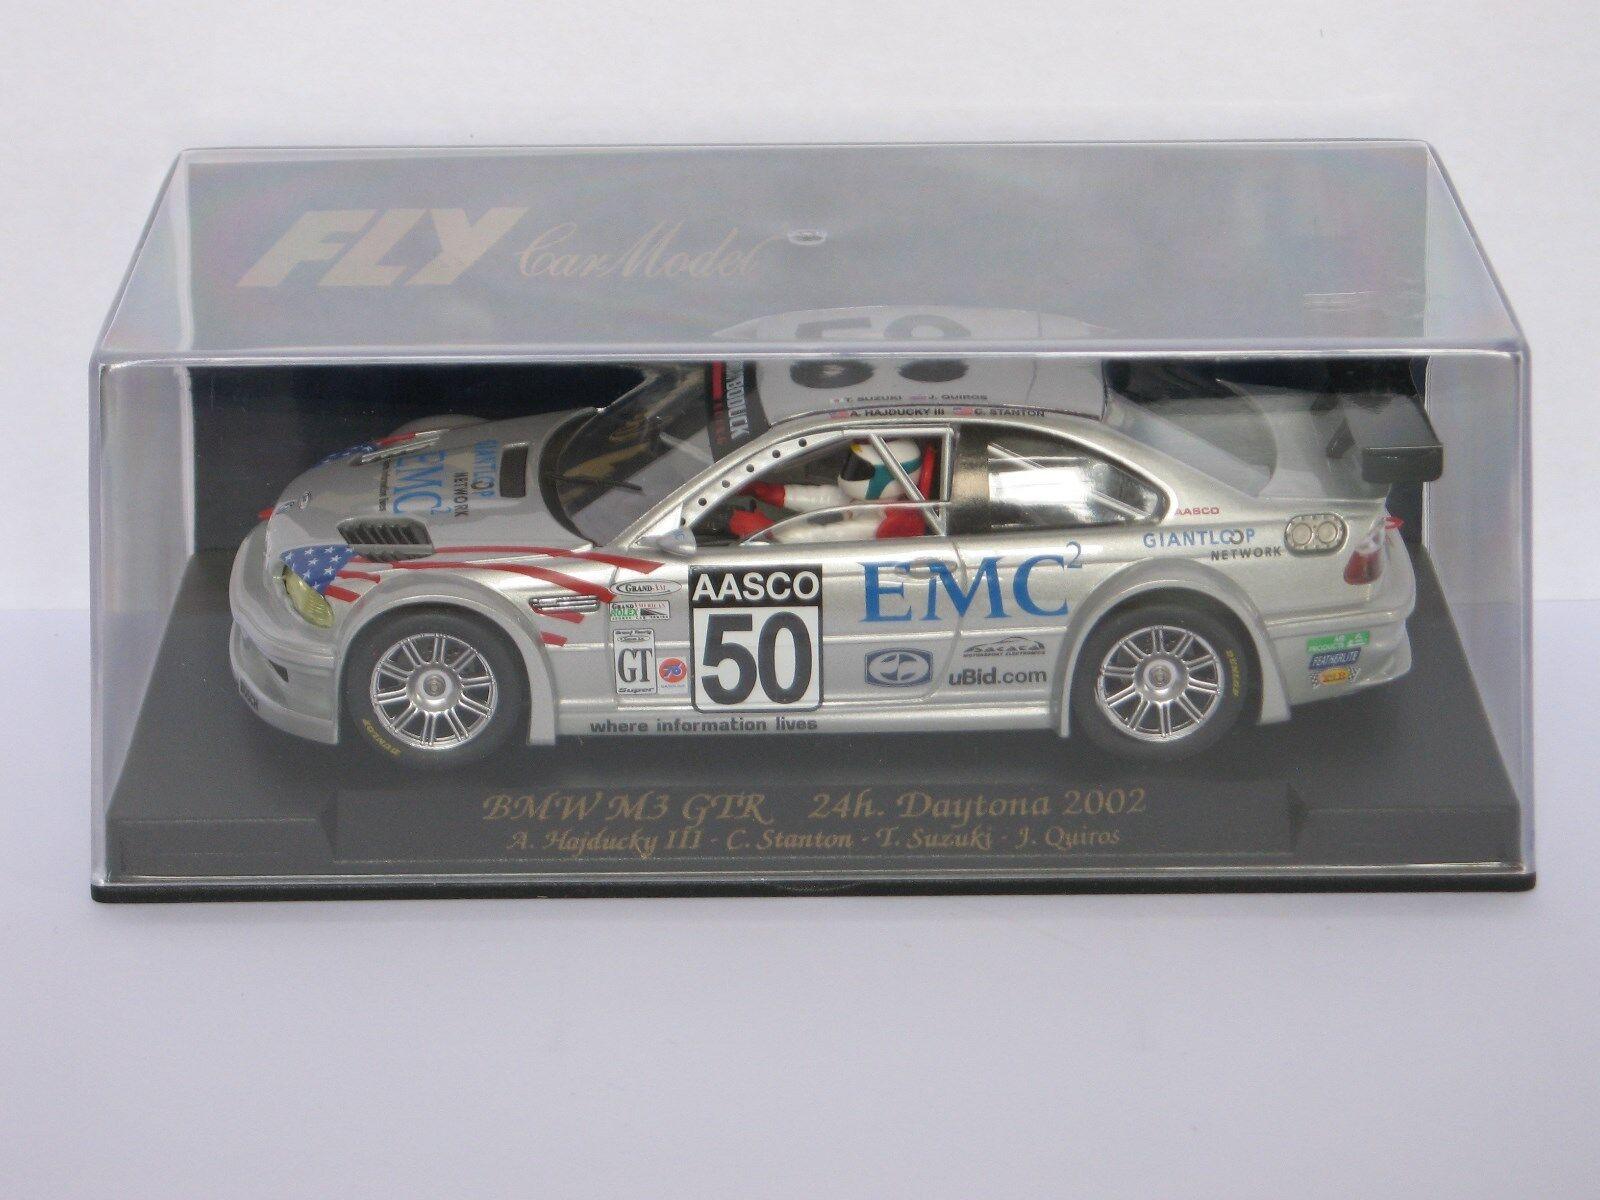 Fly BMW M3 GTR 24h. Daytona 2002 A285 88009